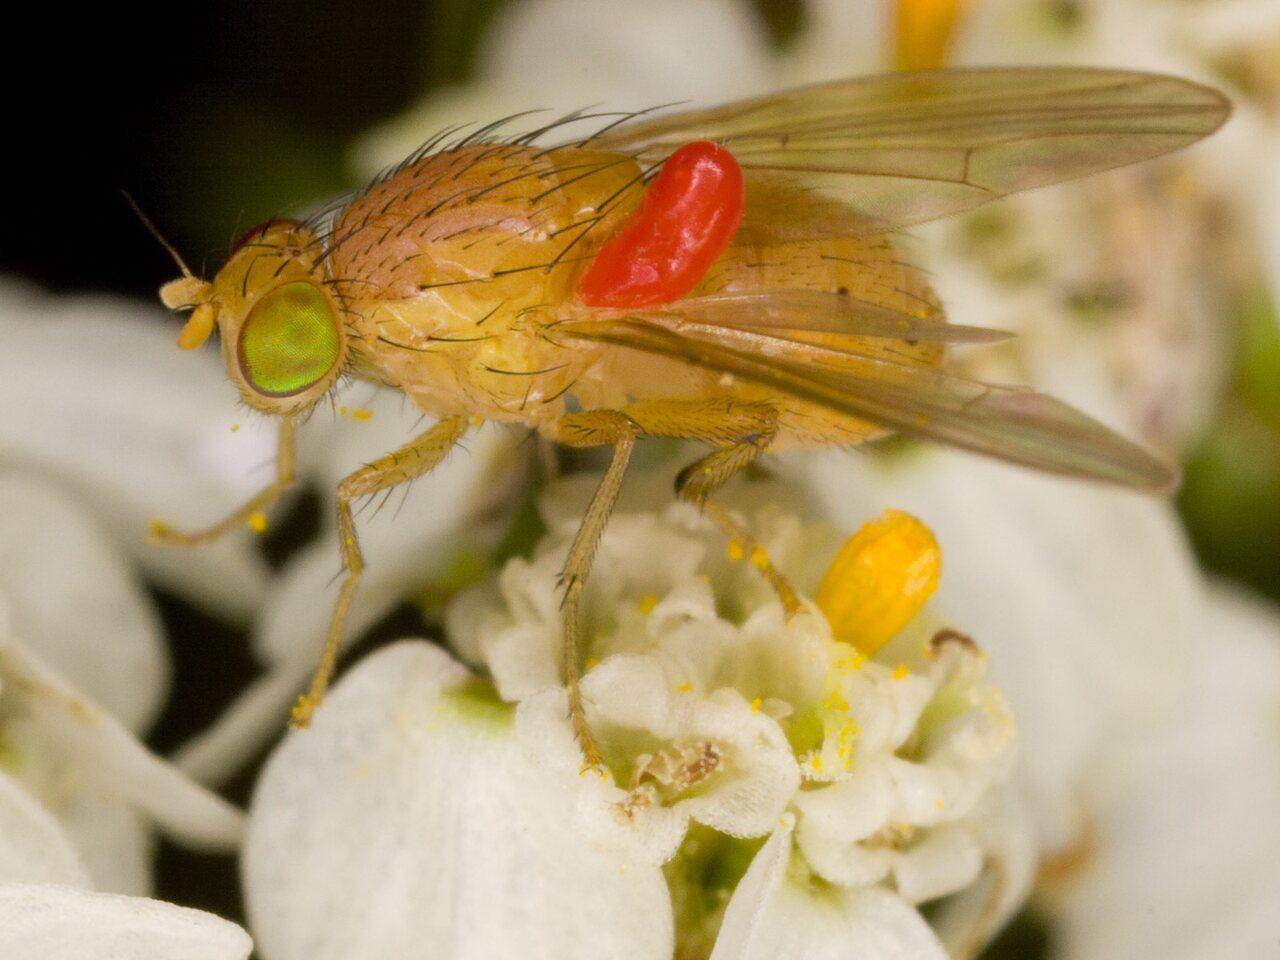 Diptera-3715.jpg